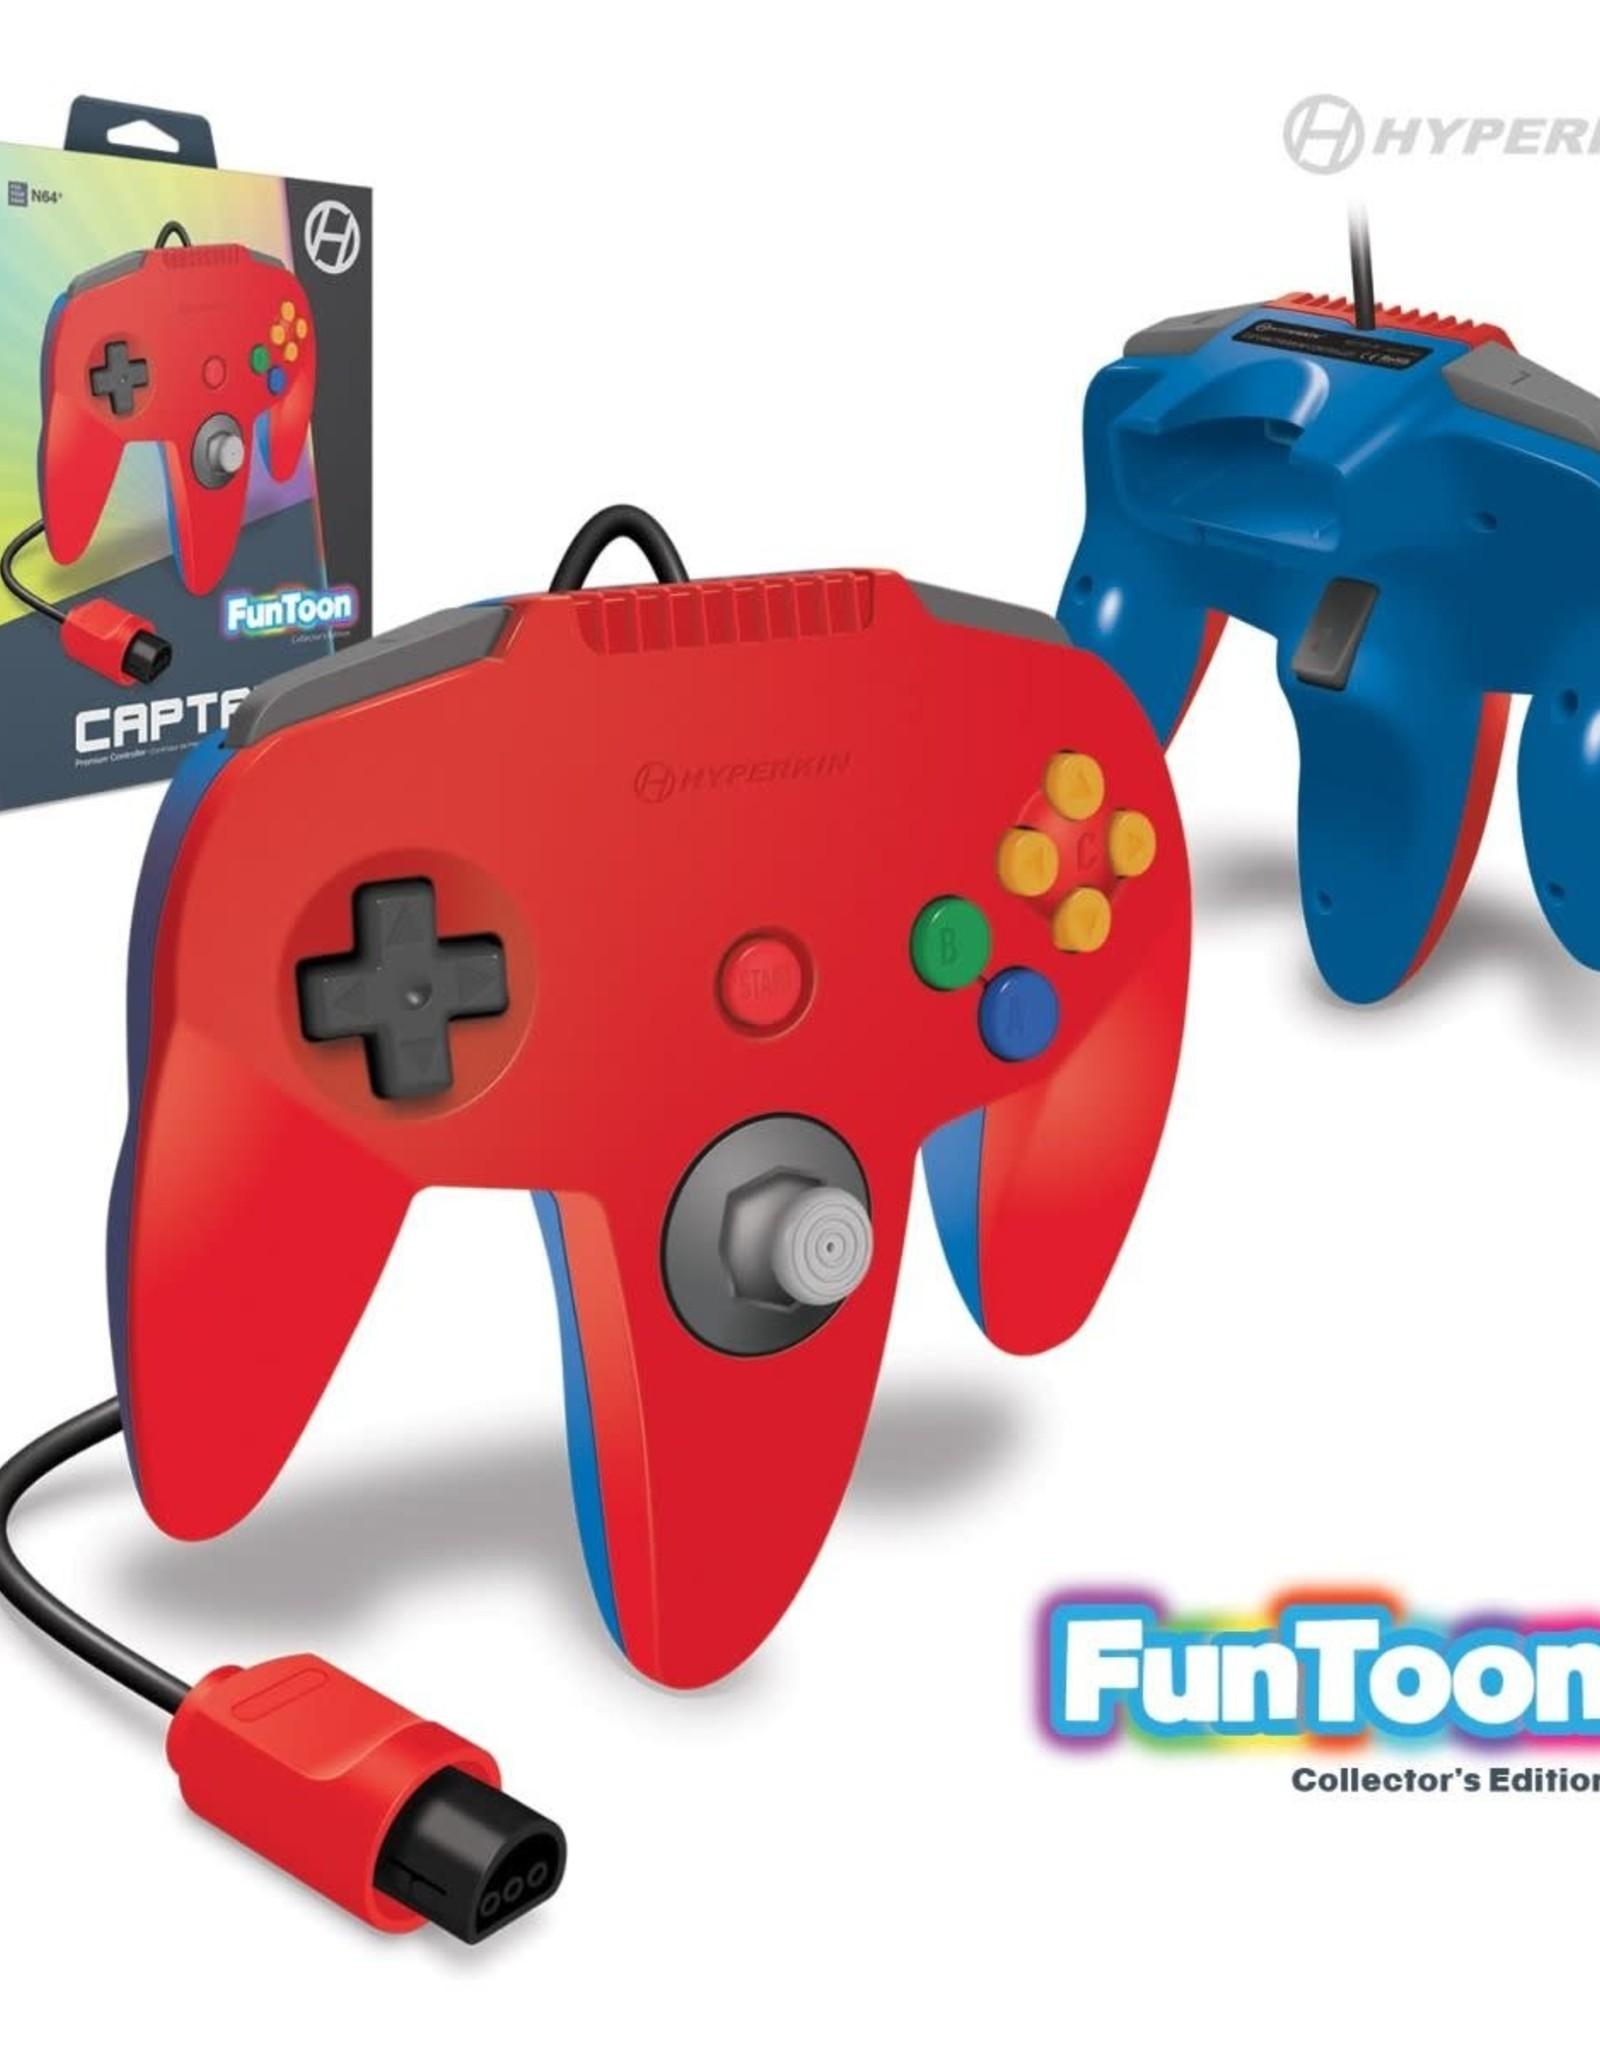 "Hyperkin ""Captain"" Premium Controller For N64 Funtoon Collector's Edition (Hero Red)"